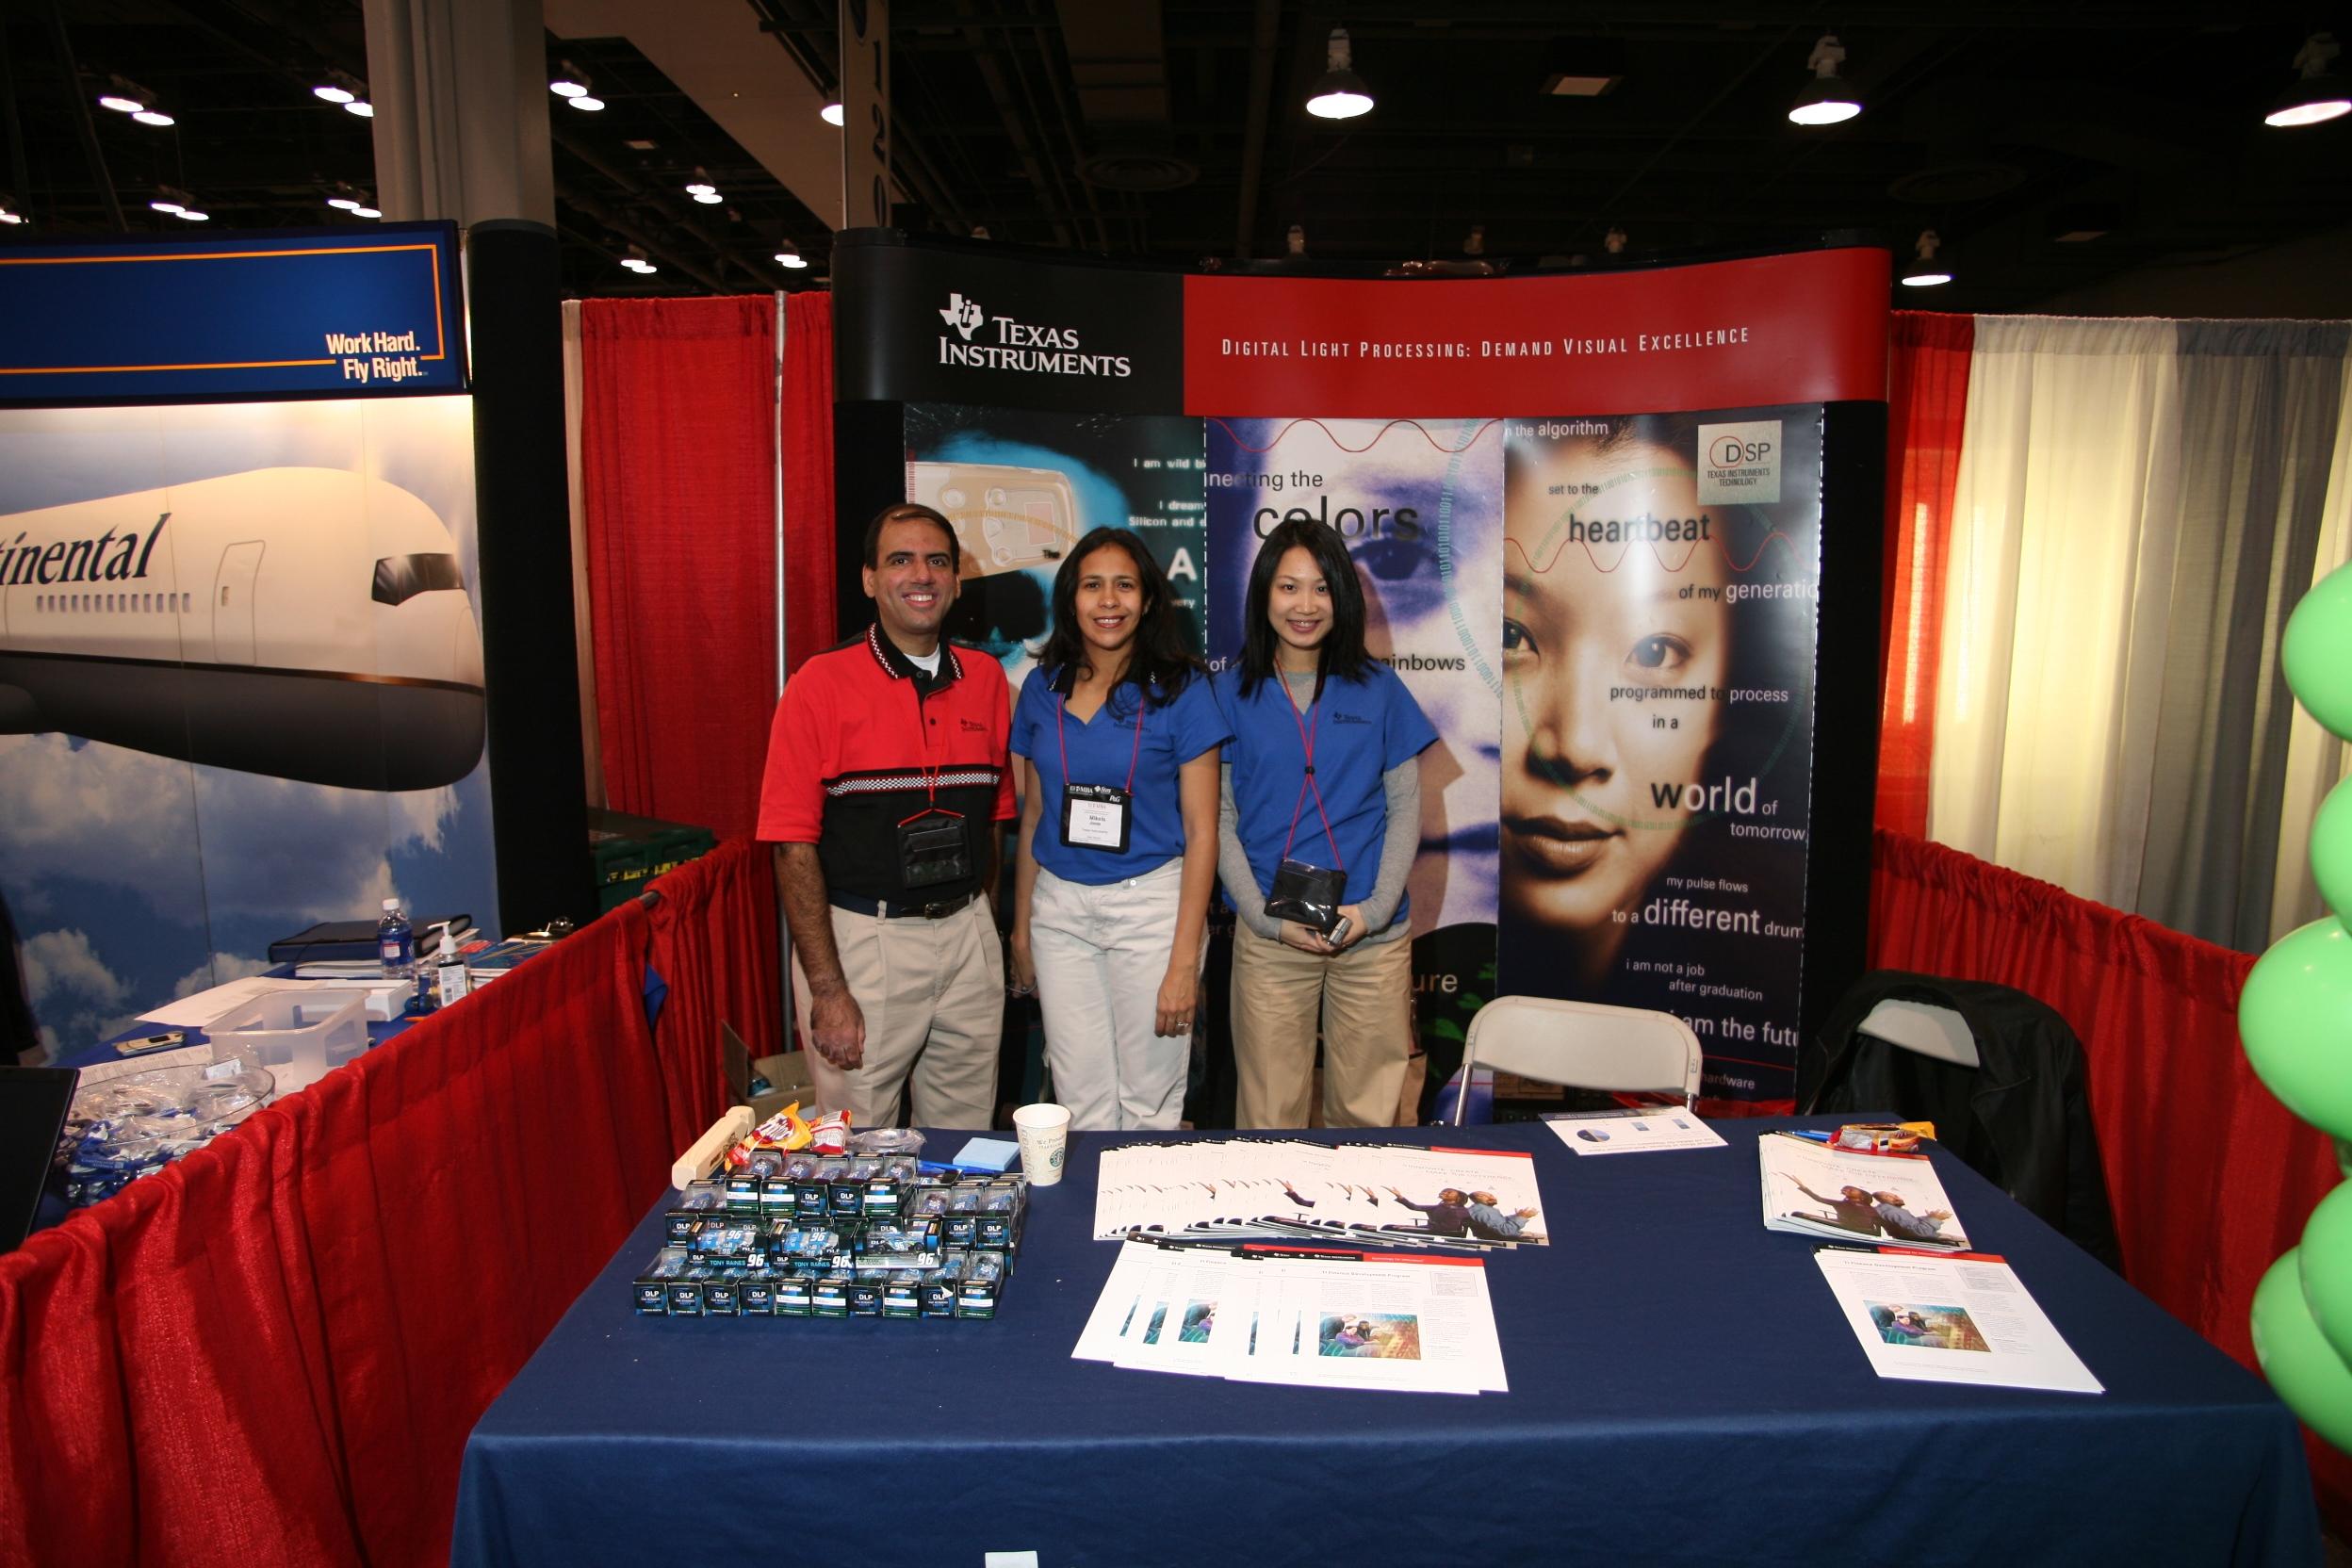 Job Fair - Texas Instruments Recruitment Team